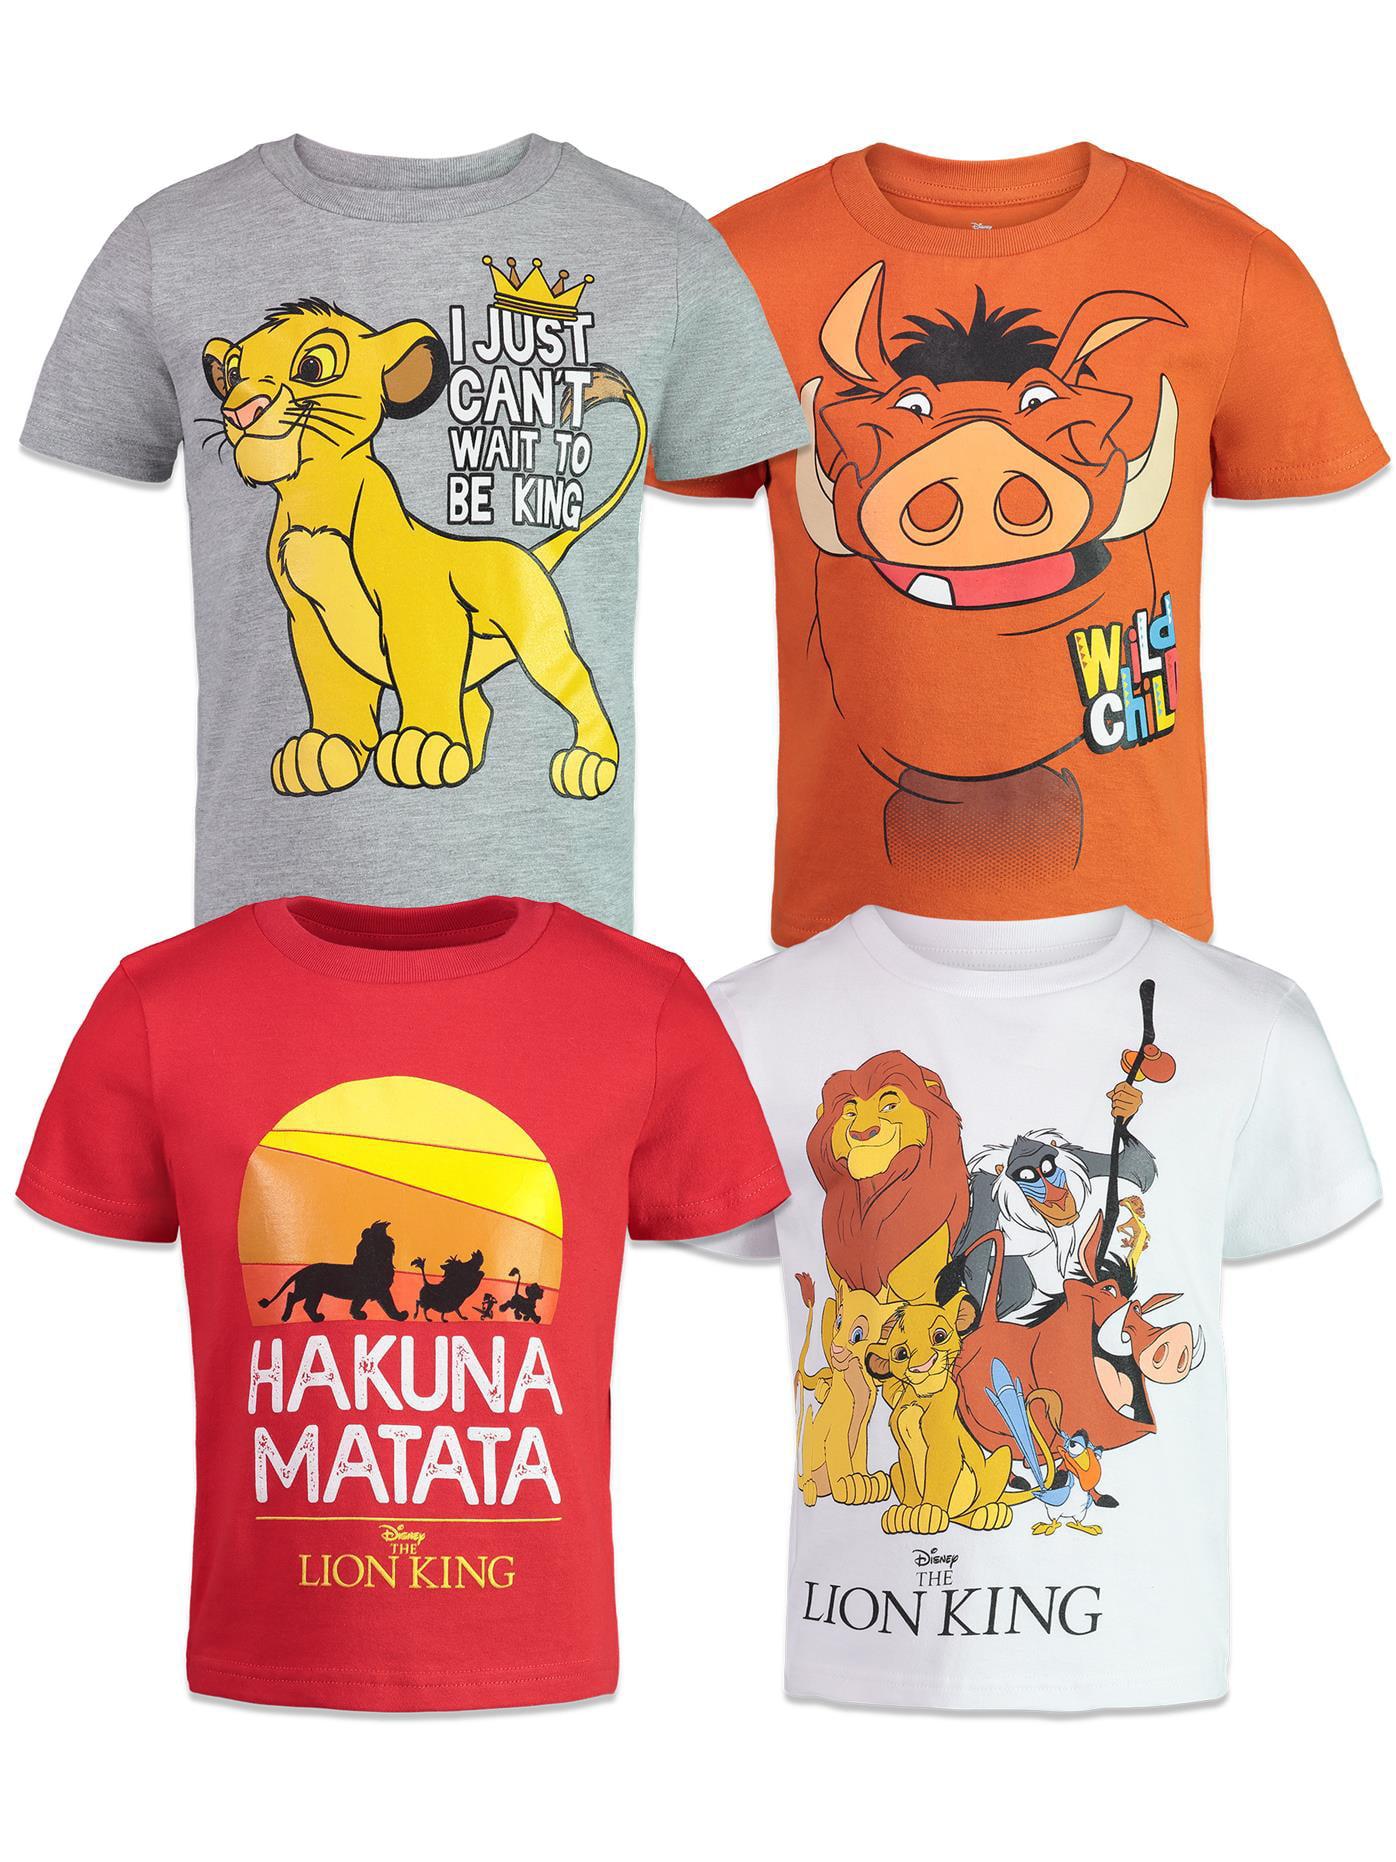 Disney Store Lion King Costume T Shirt Tee Girls Size 14 Simba Nala Pumbaa Timon